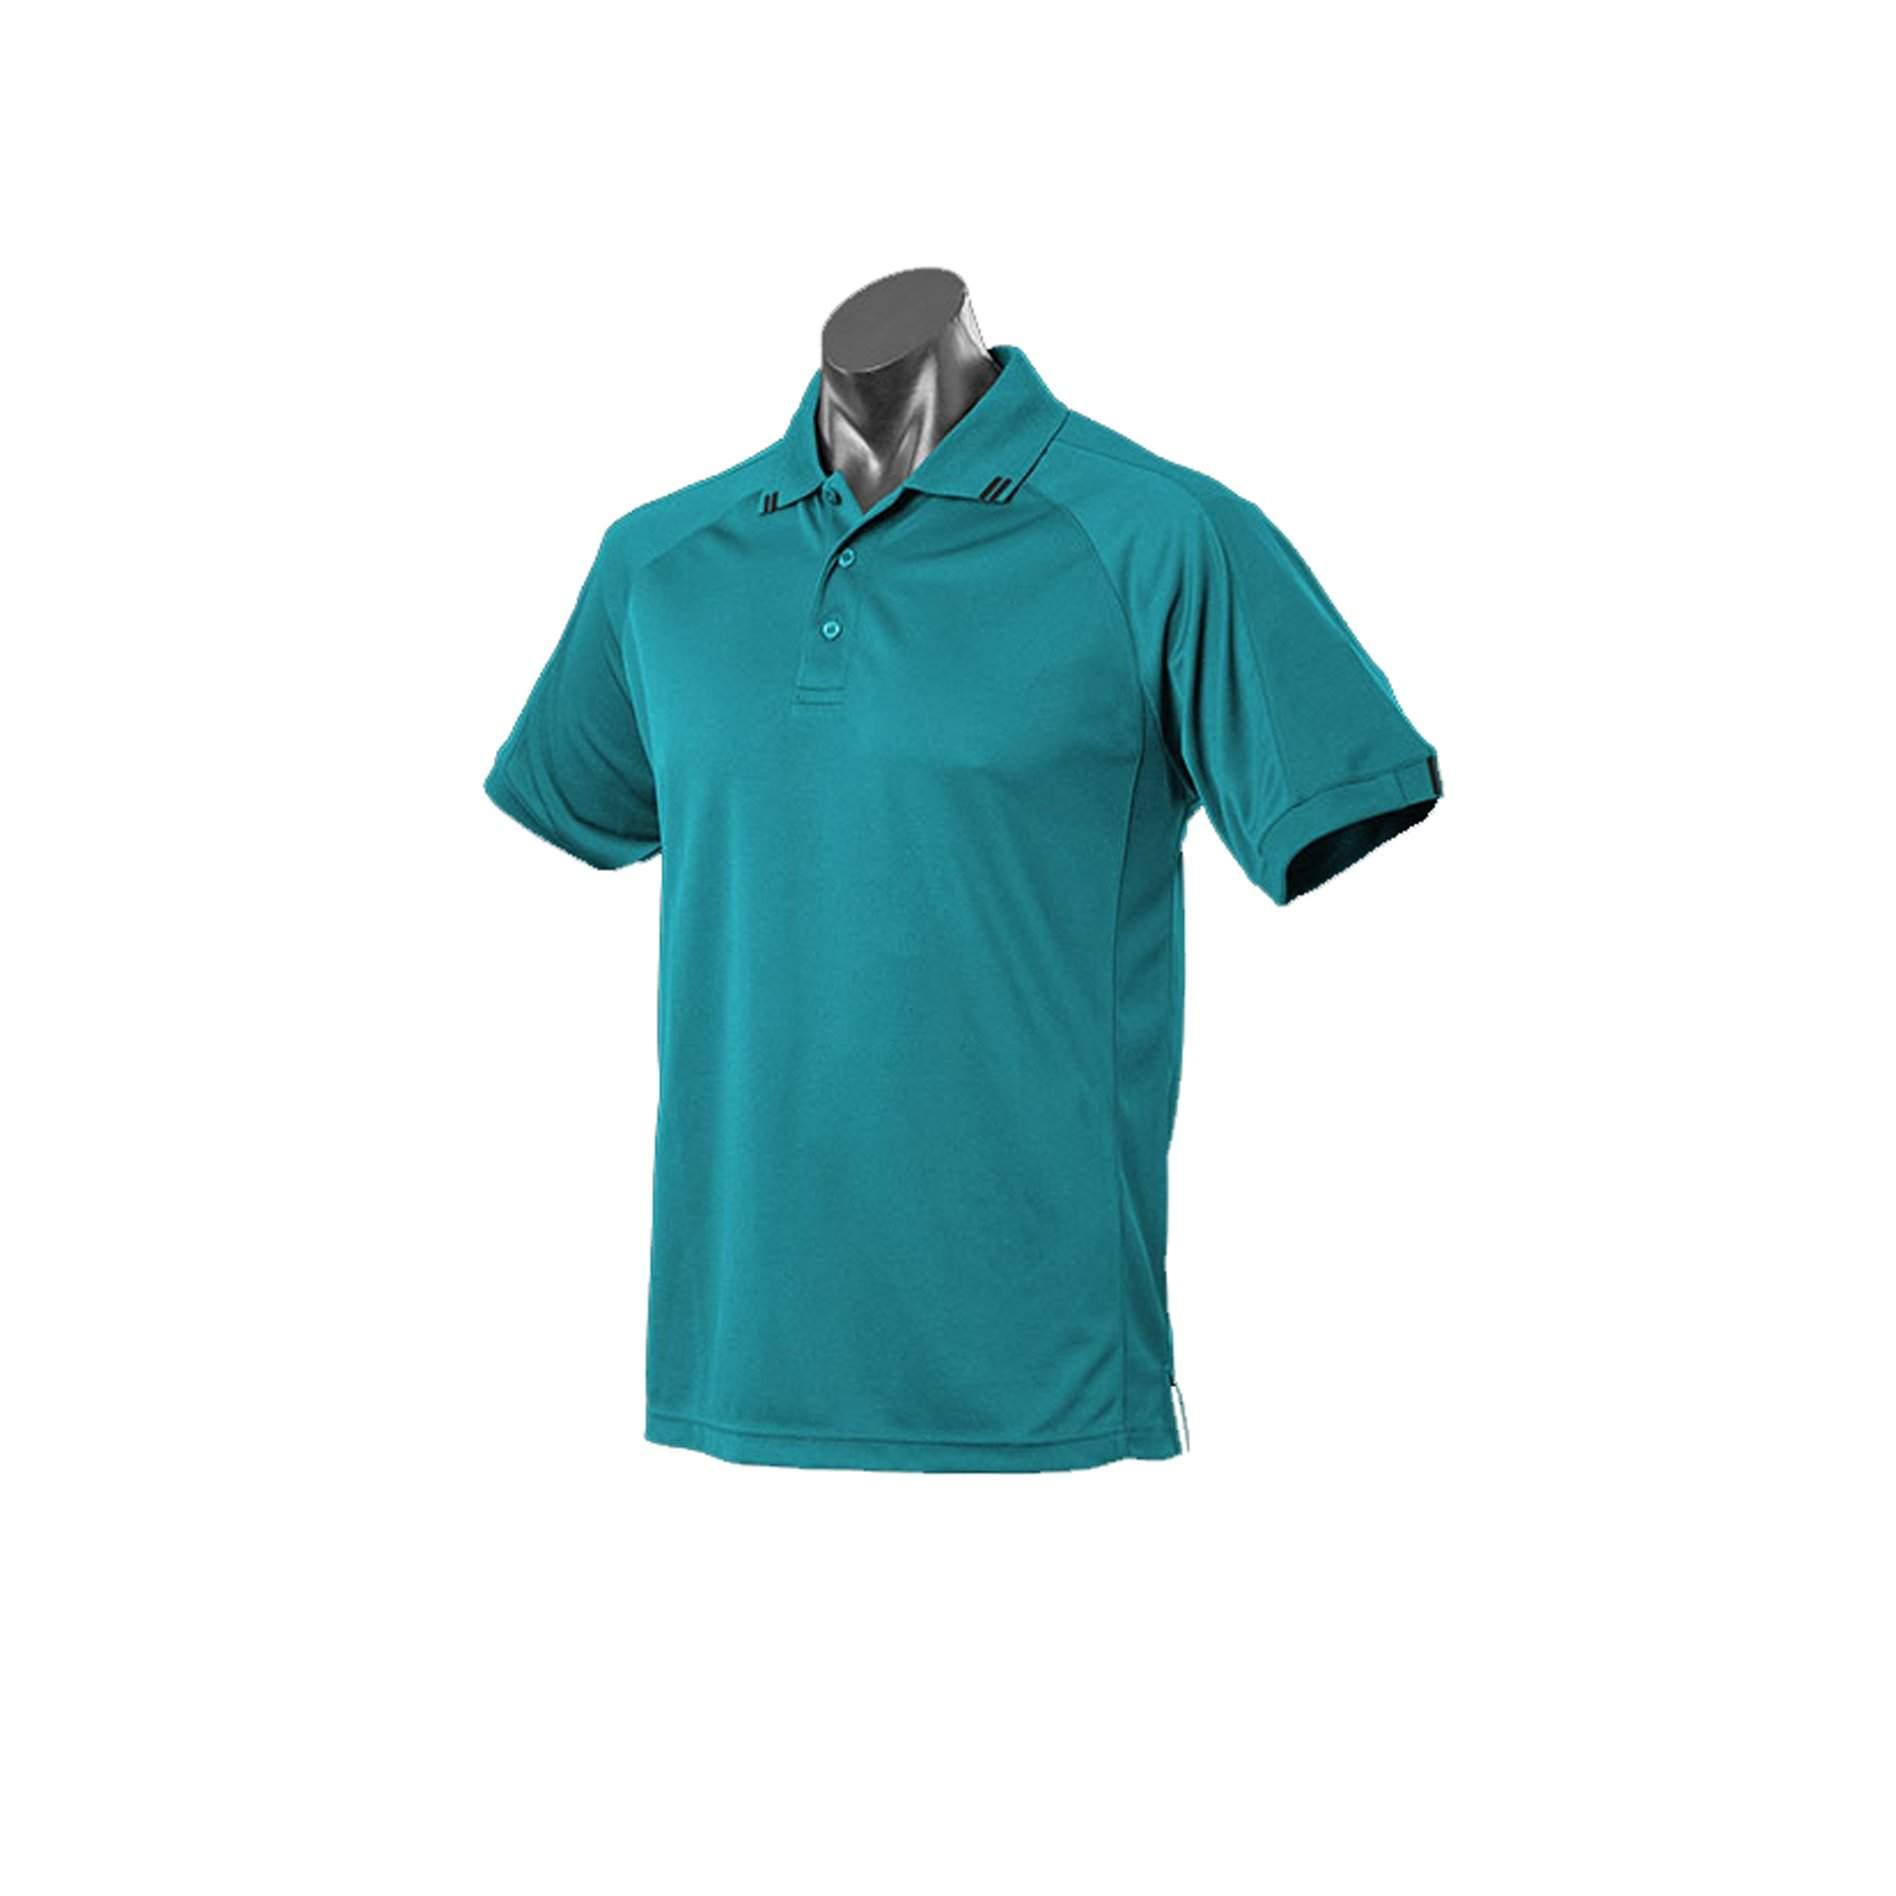 Corporate T Shirt Printing Sydney